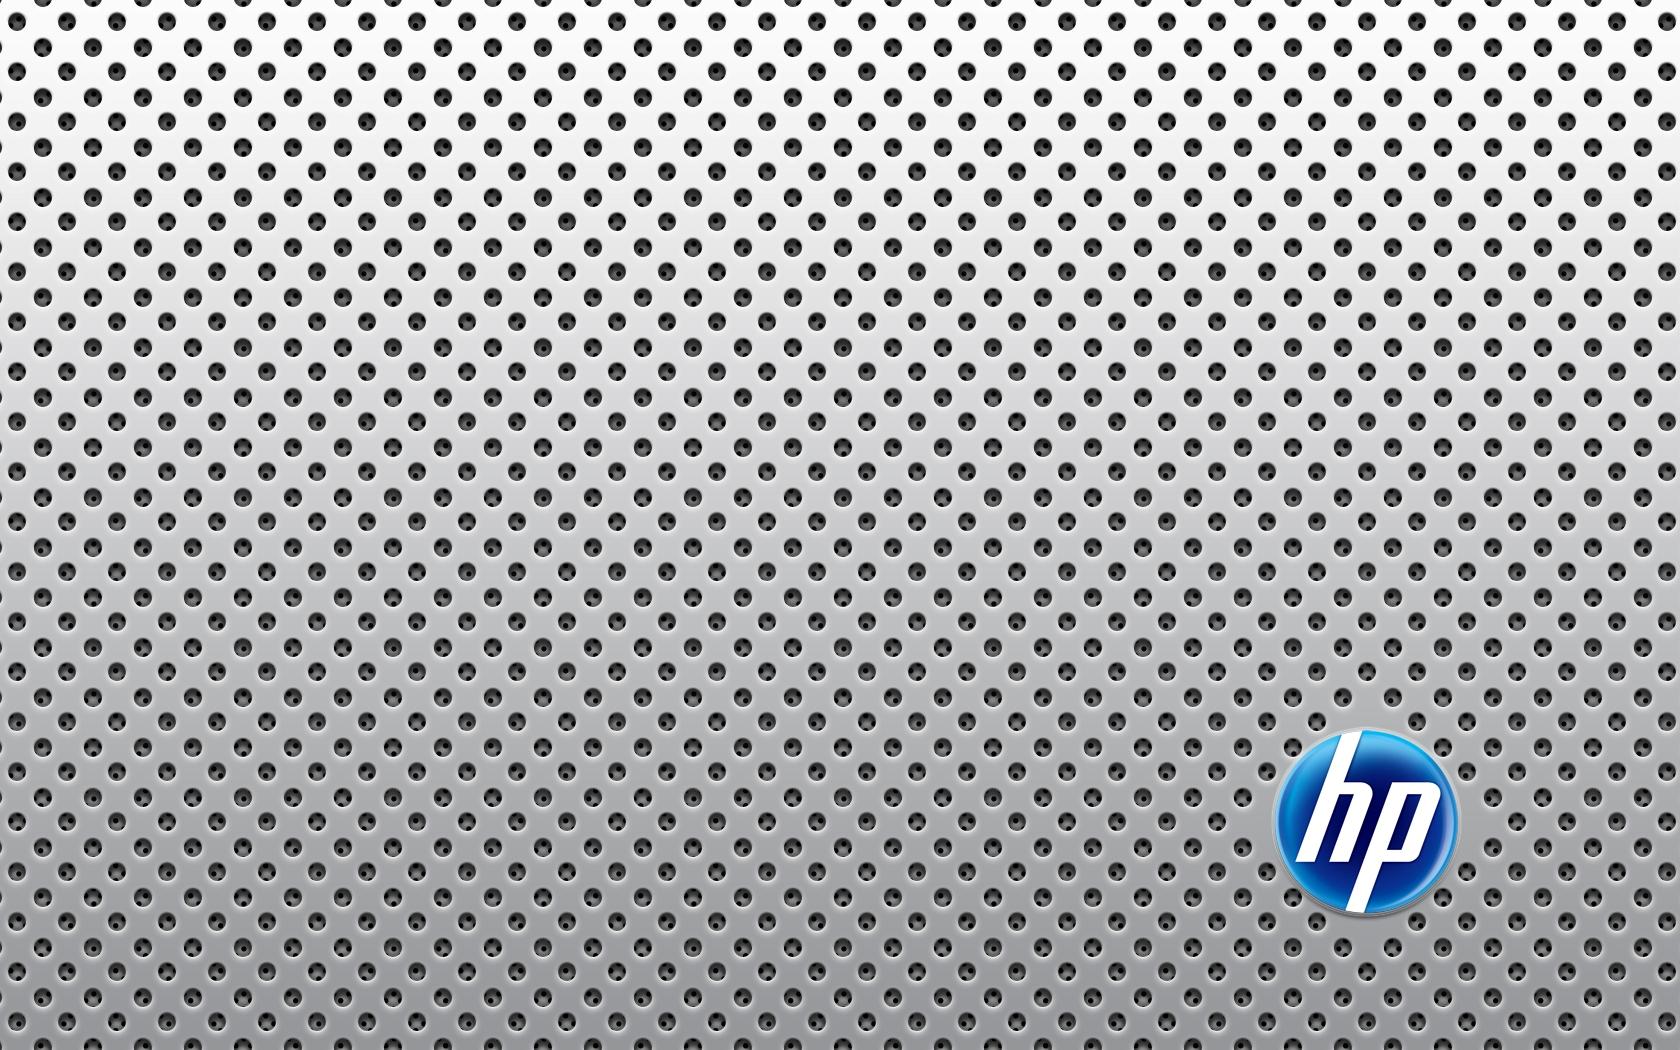 Hp Hd Wallpapers: HP Wallpapers HD 1080p